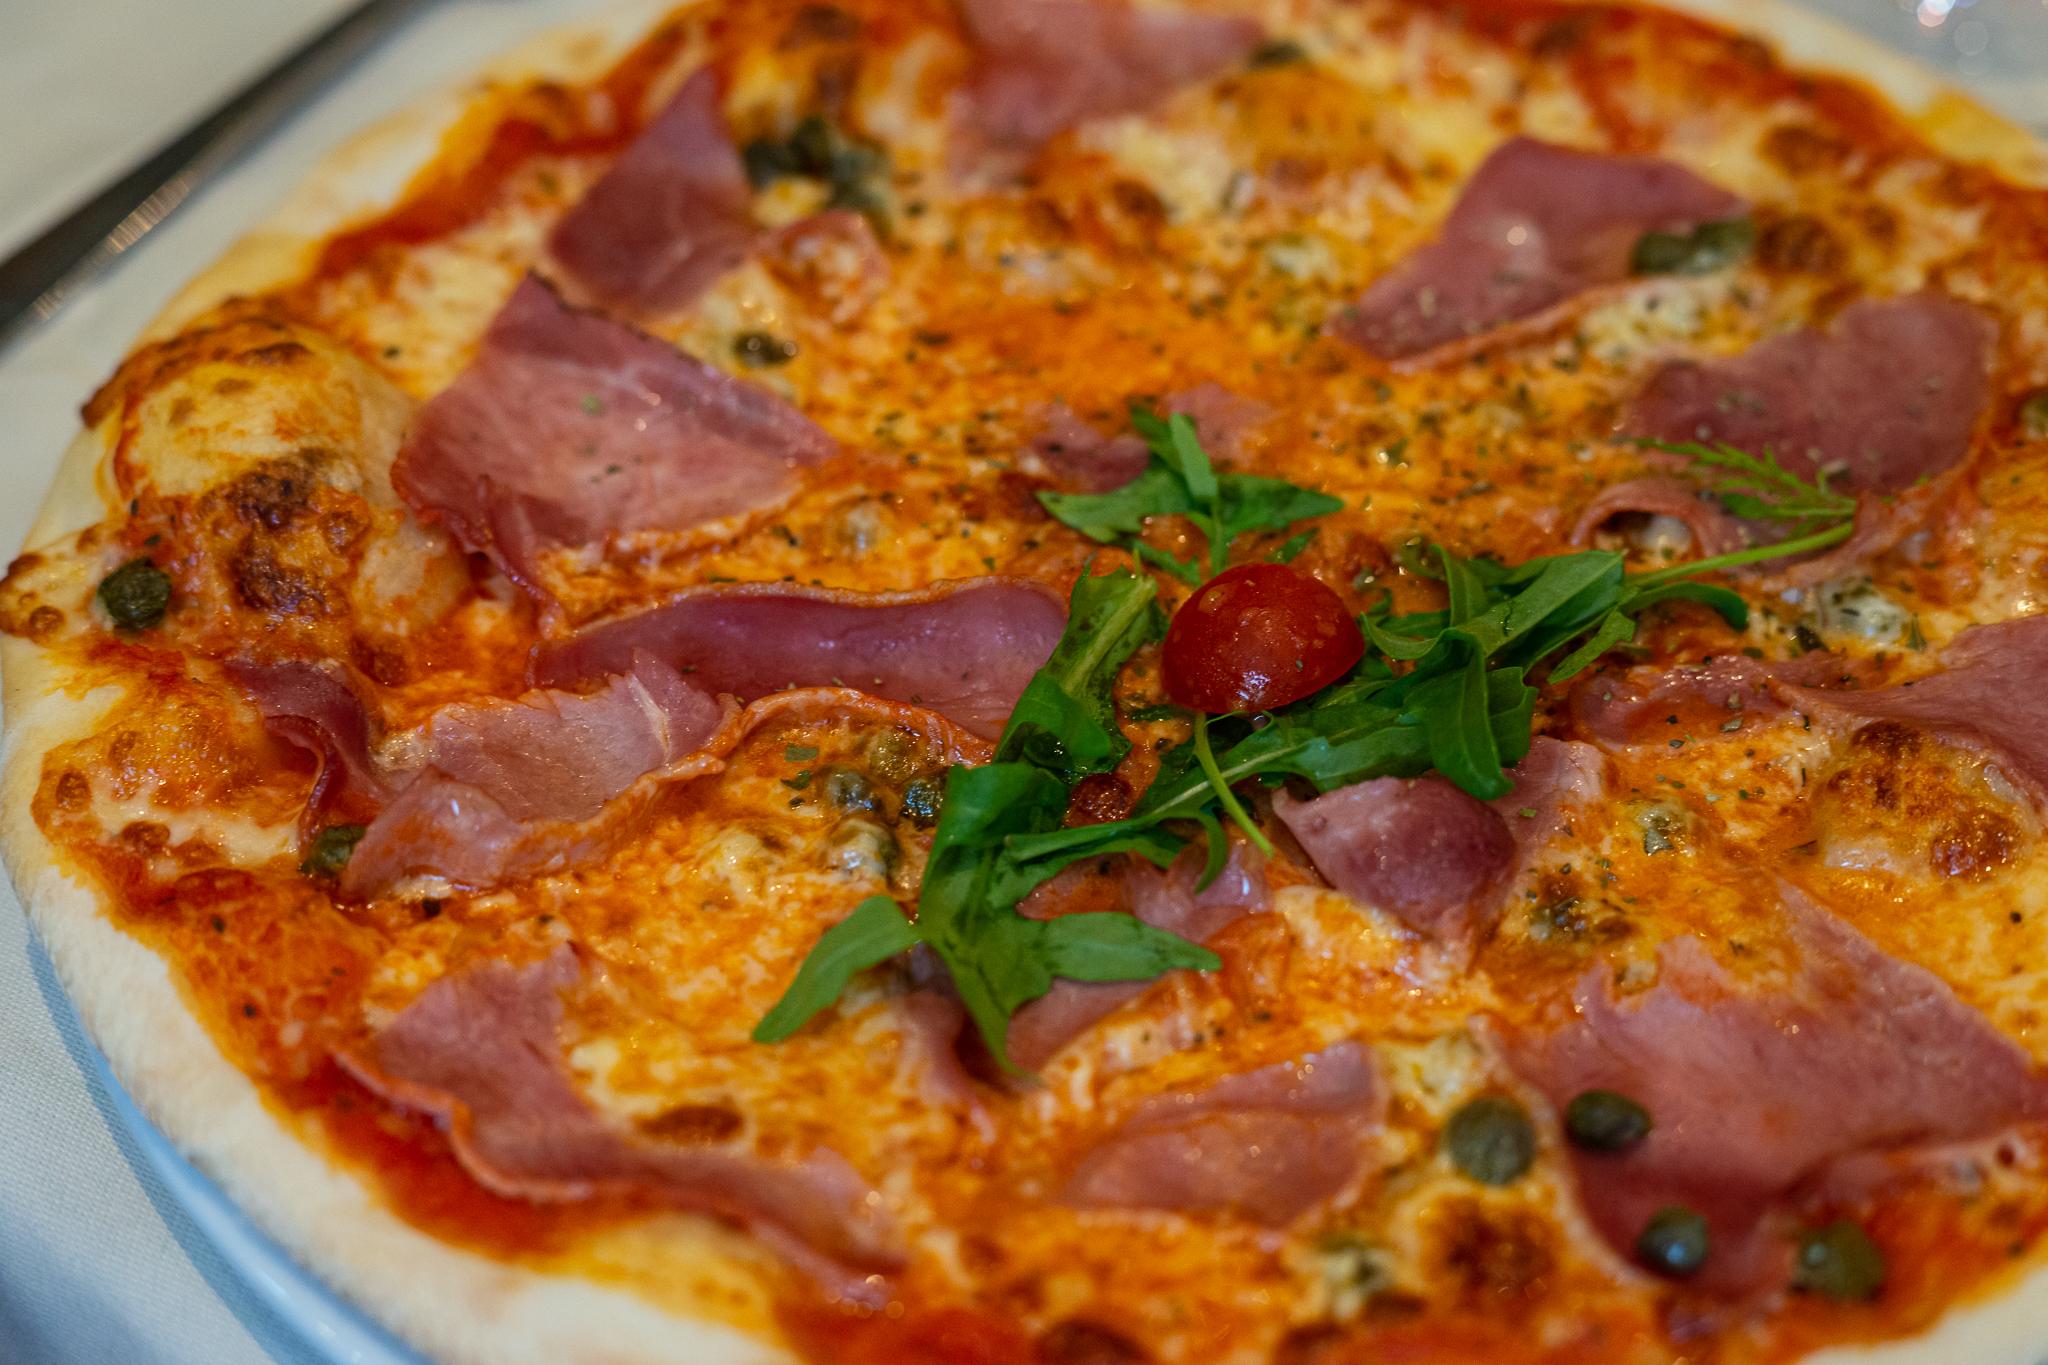 Ristaurant Pizzeria La Vita